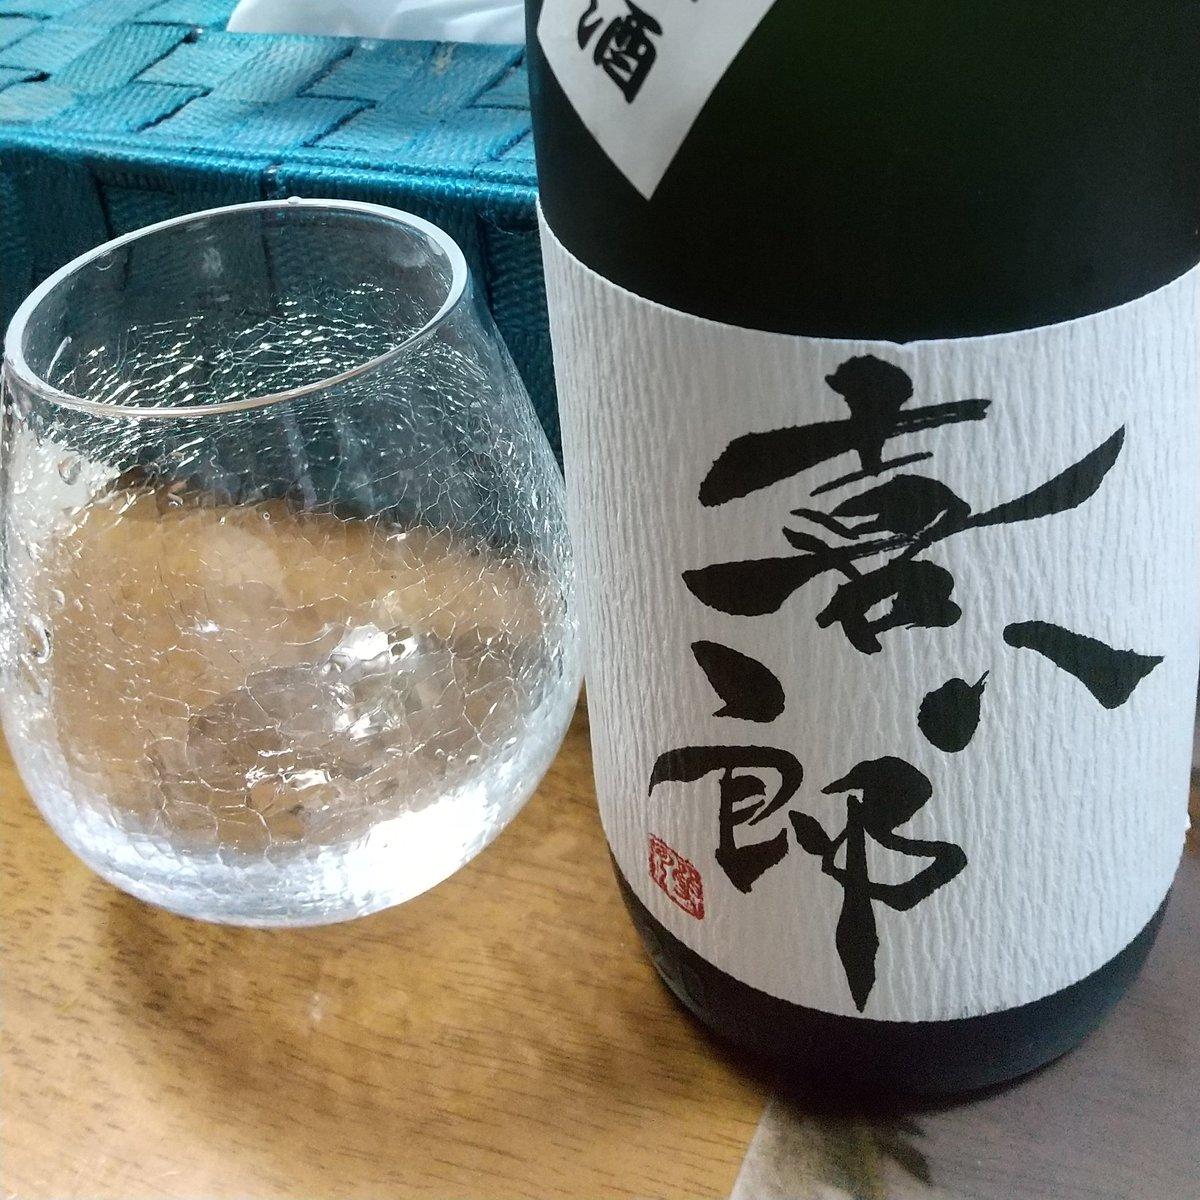 test ツイッターメディア - 埼玉県飯能市五十嵐酒造様 喜八郎🎵県内ブランド?涼やかで綺麗な一杯、酸が心地よい🎵 こんなに綺麗で旨い日本酒なのにな。安い上に市内でしか見ない。 https://t.co/pVA6y0yab0